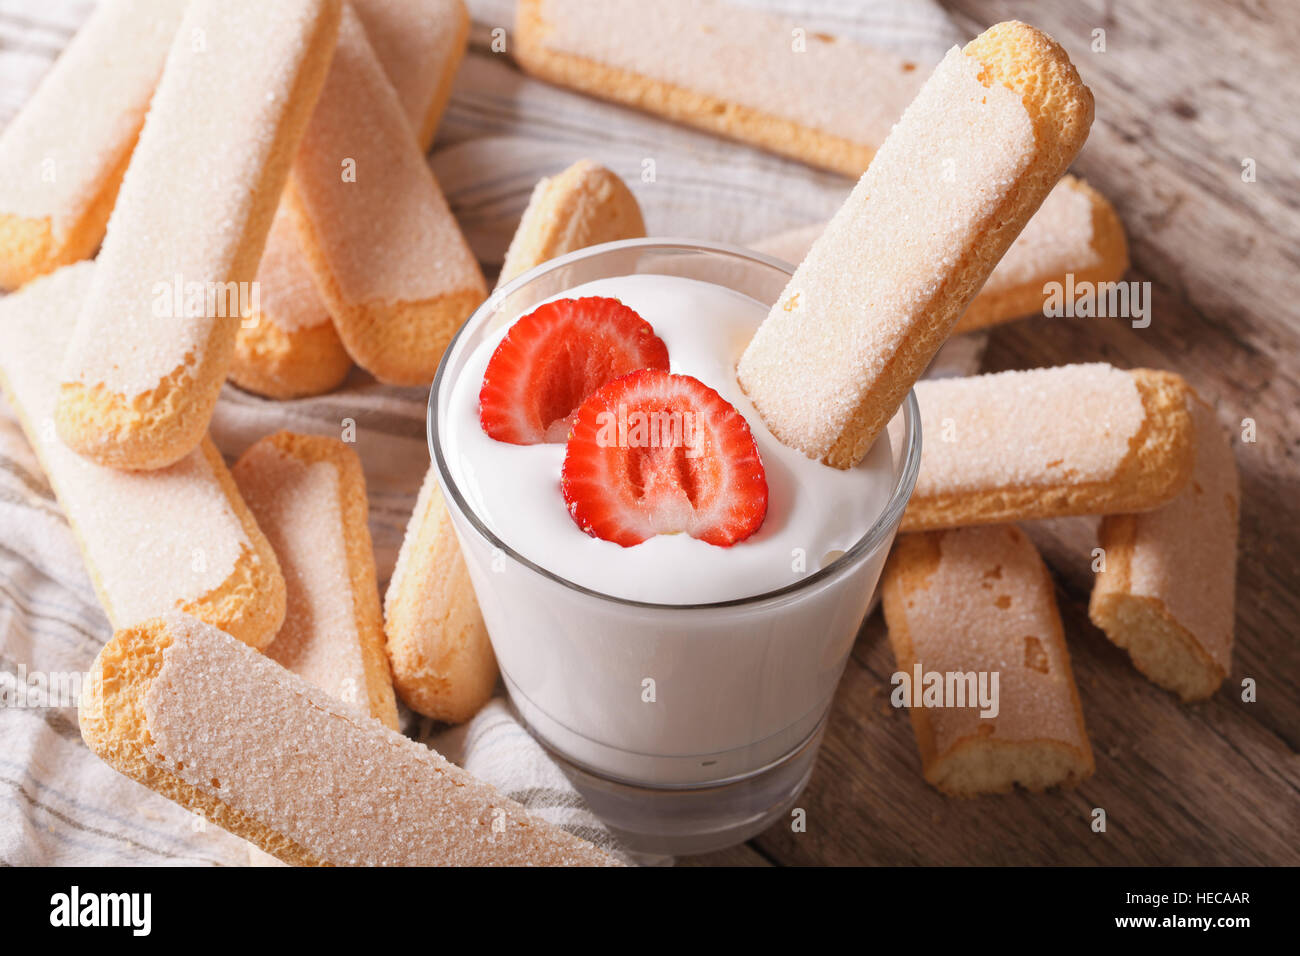 Savoiardi and whipped mascarpone with strawberries closeup. horizontal - Stock Image